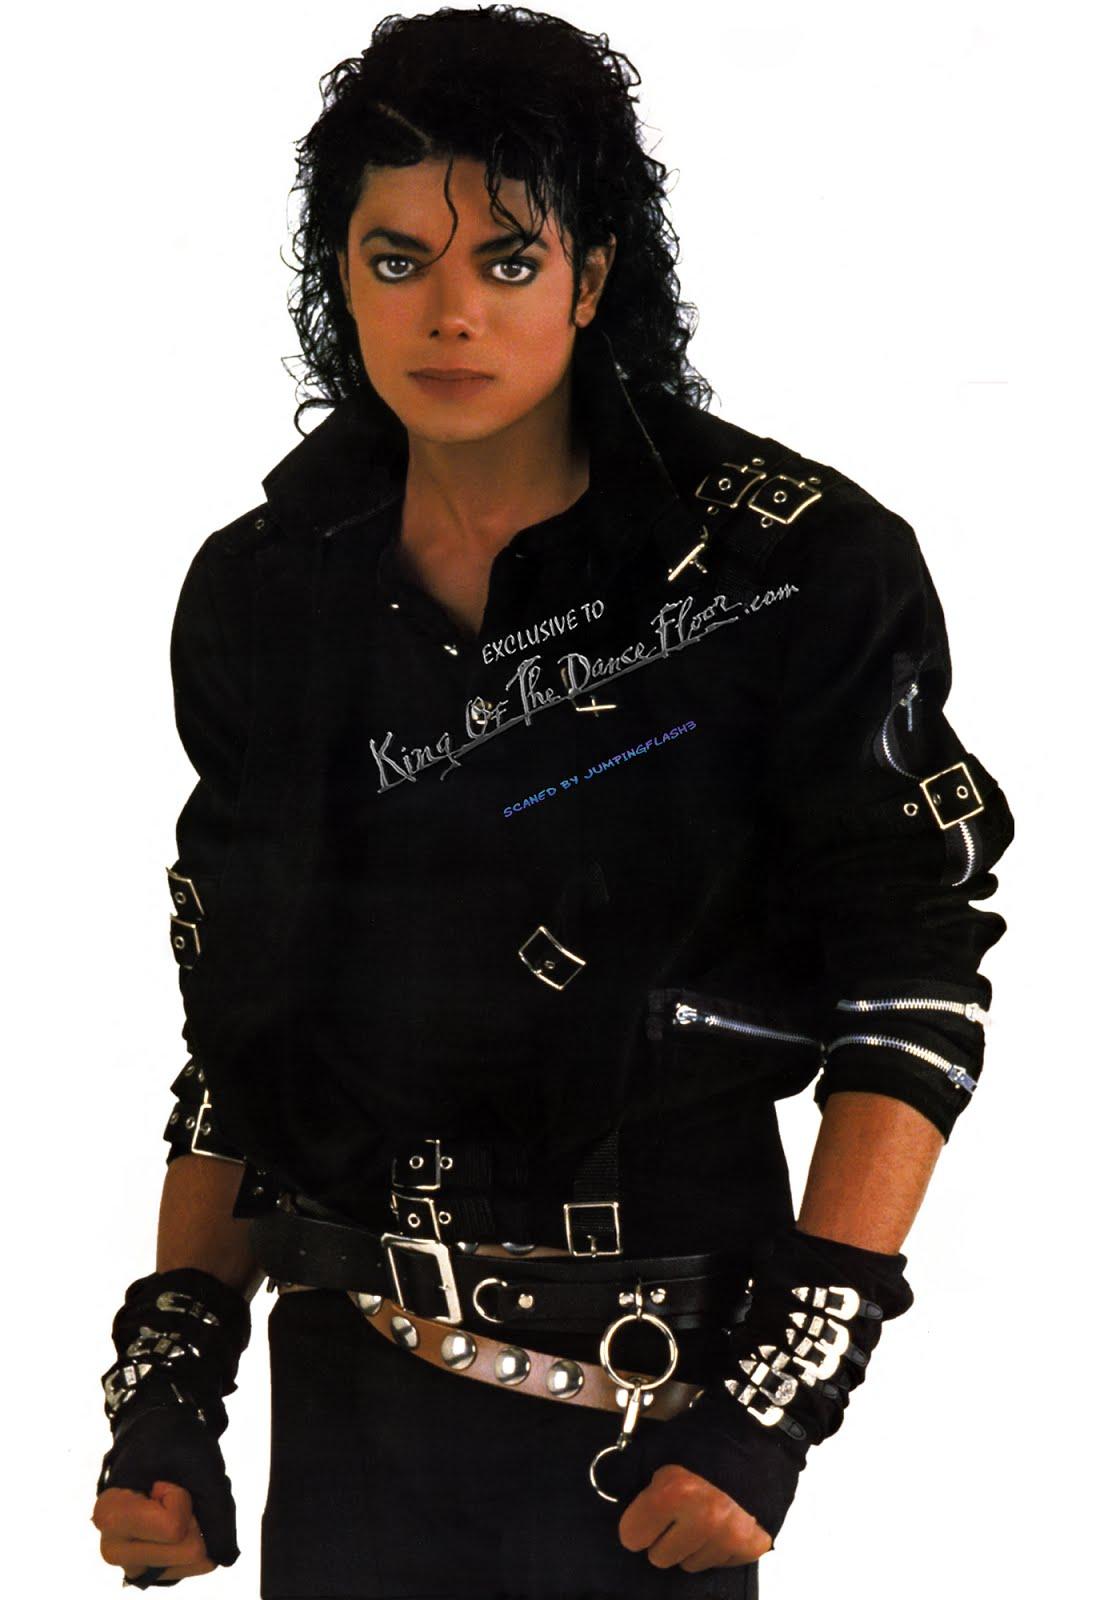 http://4.bp.blogspot.com/-_xBKFw5QZHE/UQrnKXrmclI/AAAAAAAAIYs/wSUY8sVoIzI/s1600/Michael-Jackson-BAD-Photoshoot-HQ-michael-jackson-30904810-1370-2000.jpg